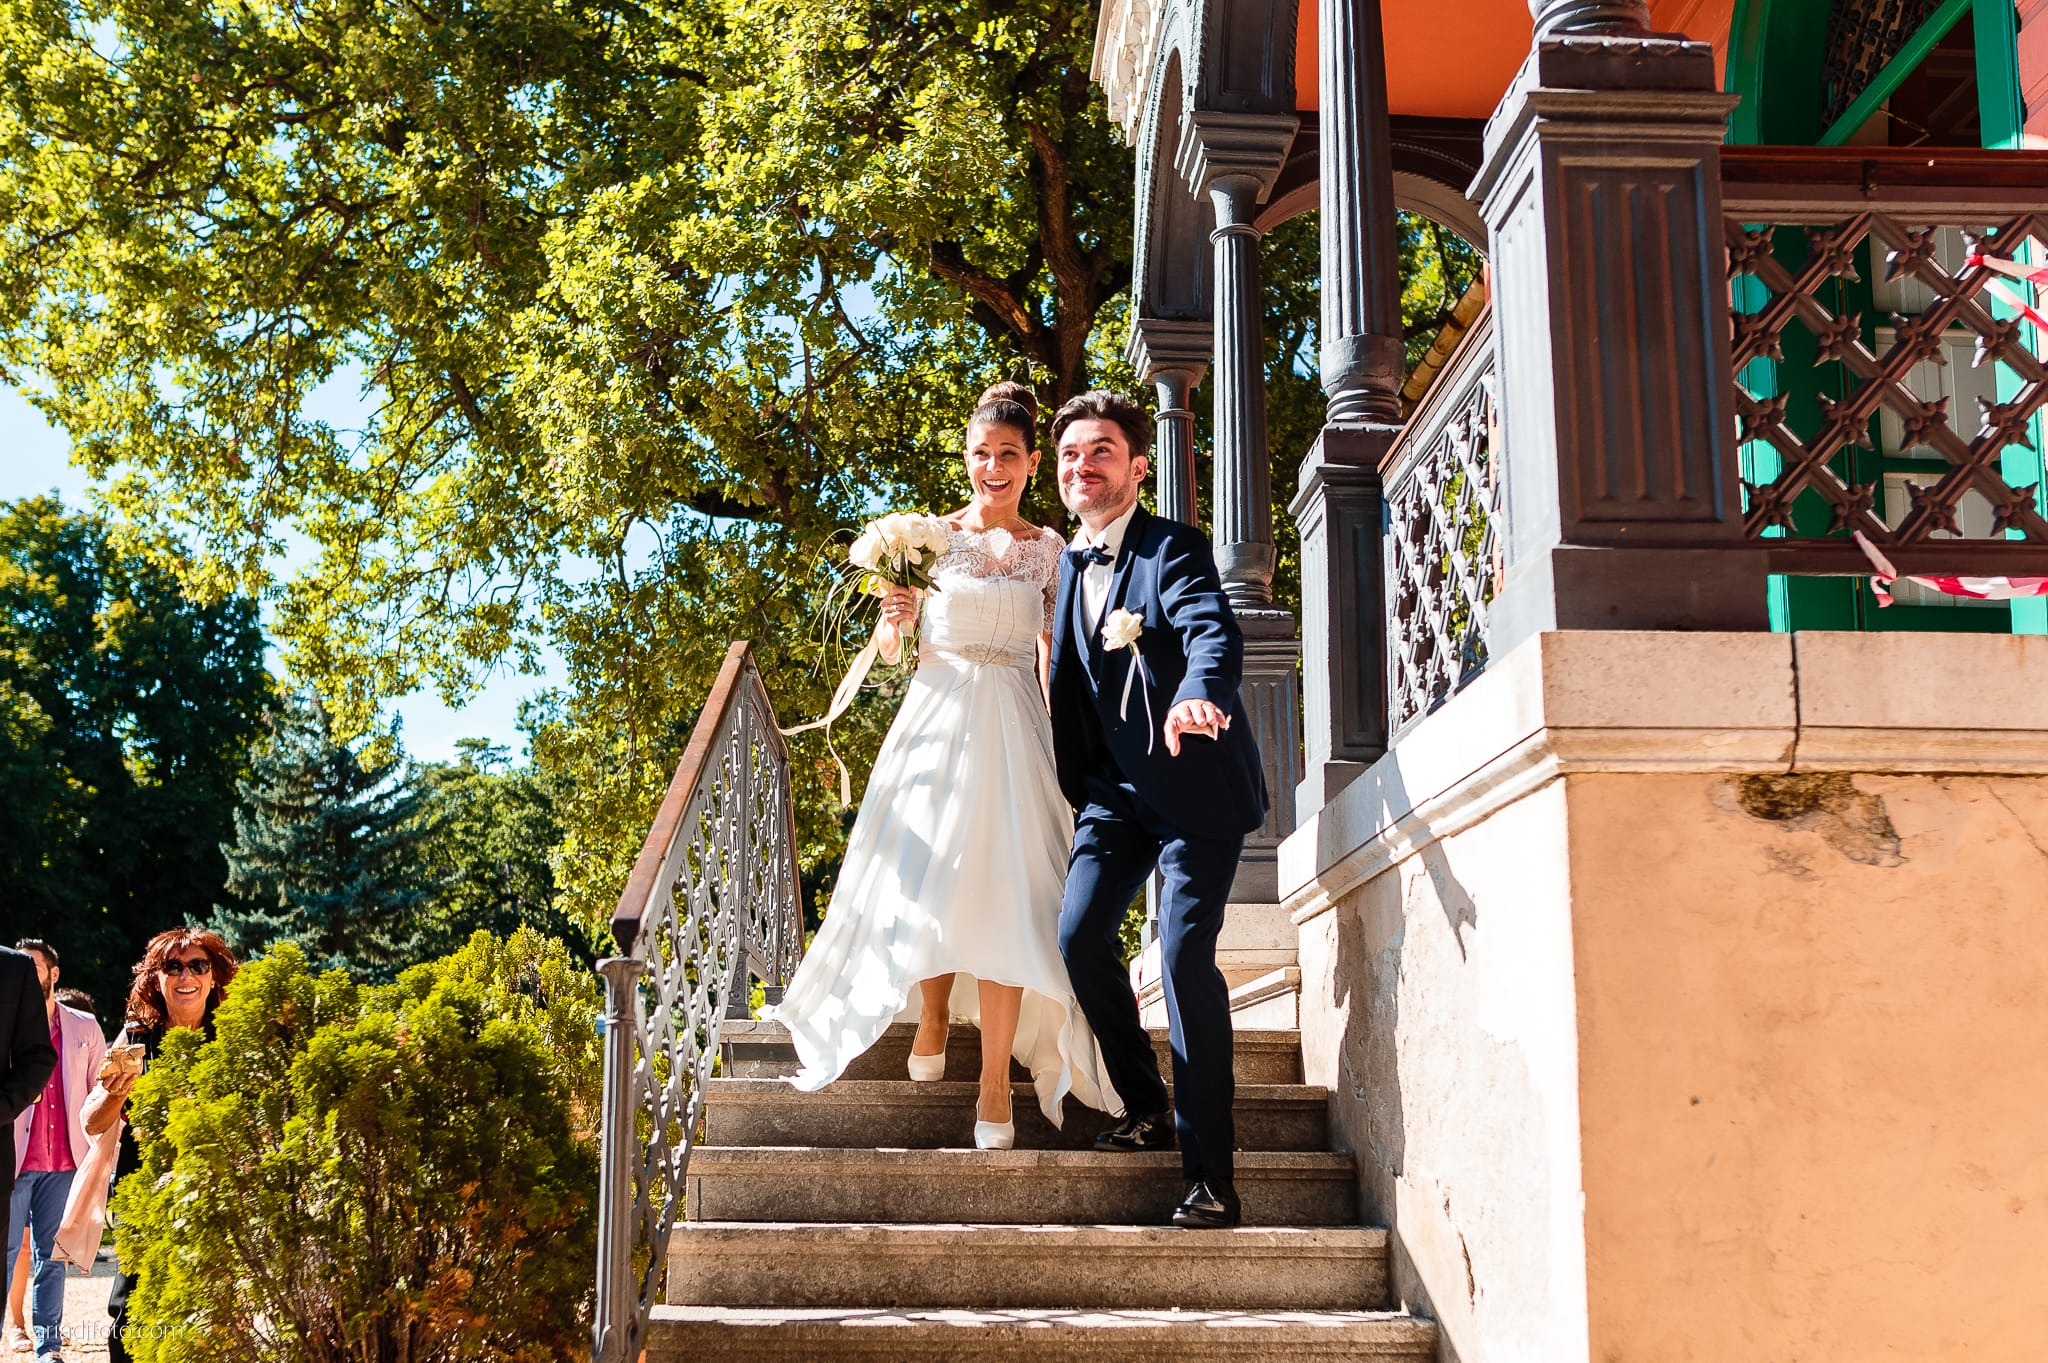 Sara & Nicolas – Matrimonio a Trieste | www.ariadifoto.com